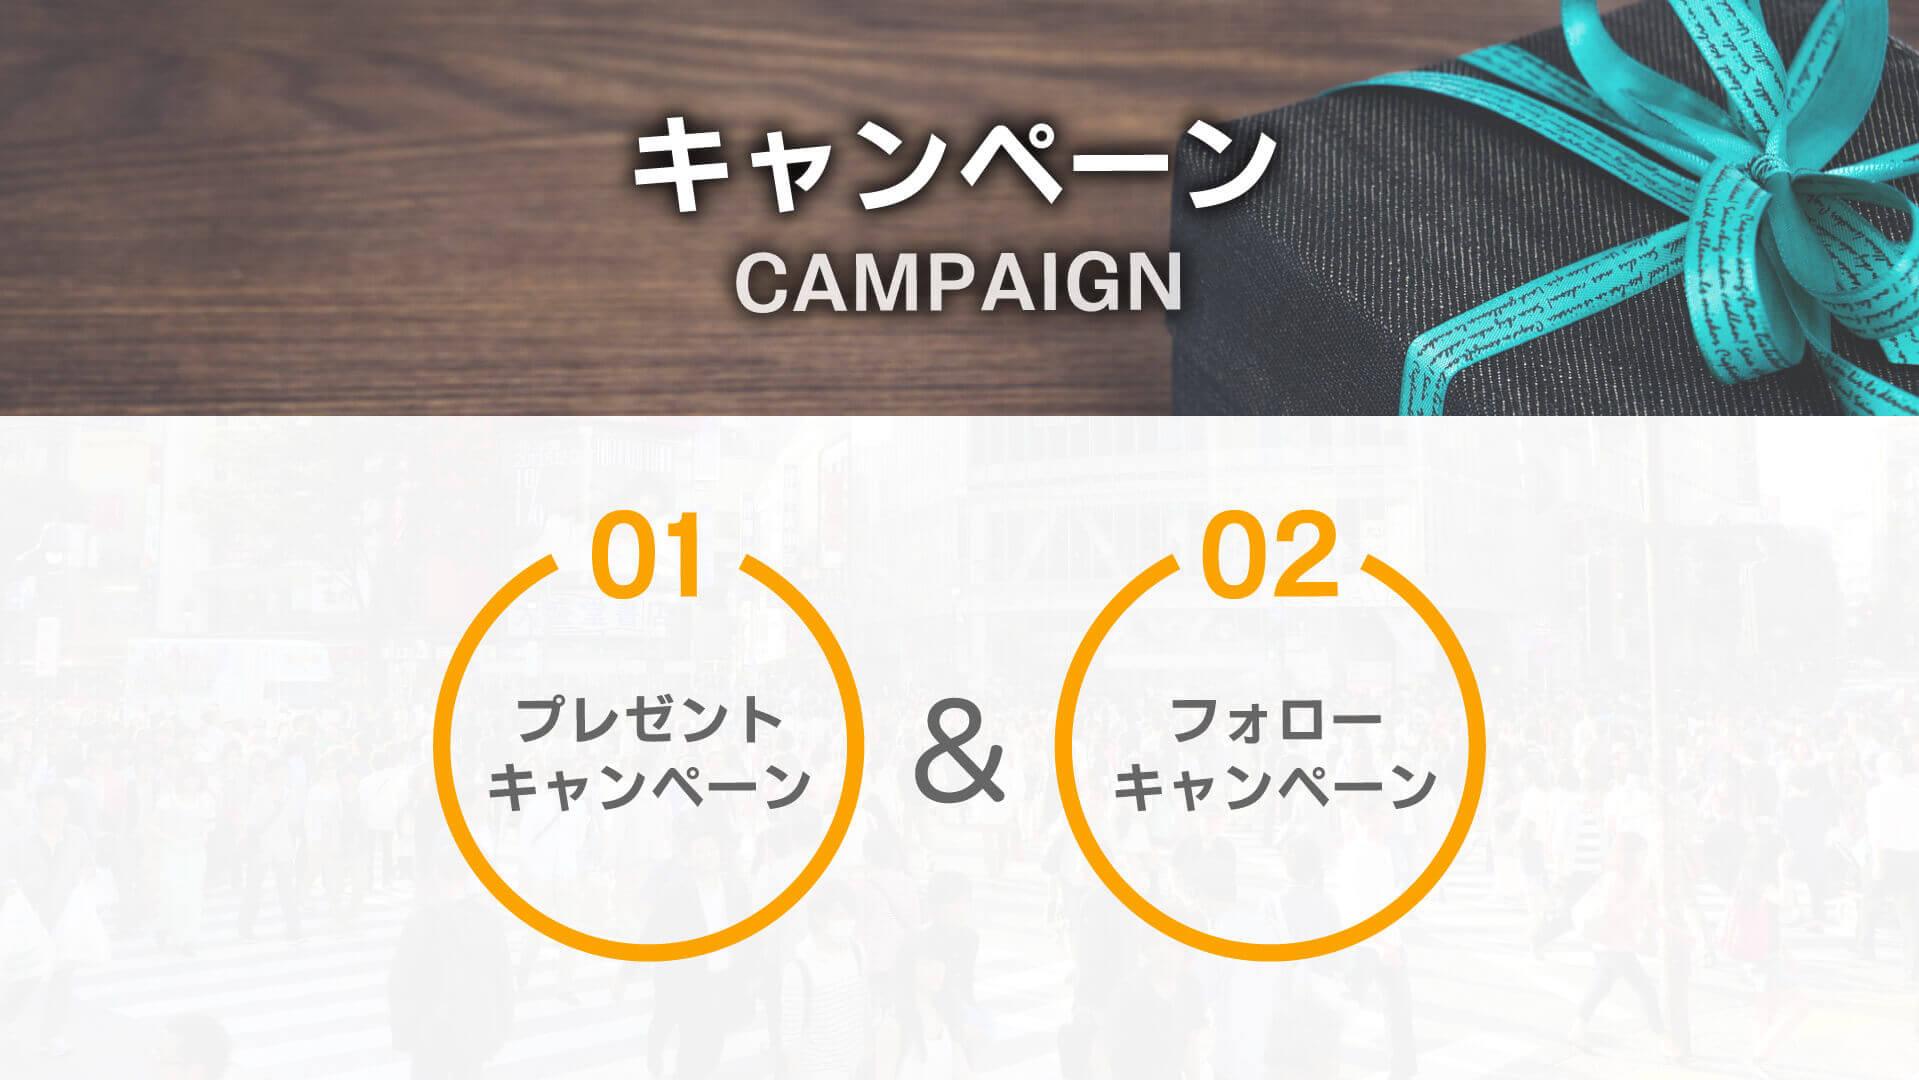 Instagramフォロワー獲得施策_記事LP_05_修正1009-2